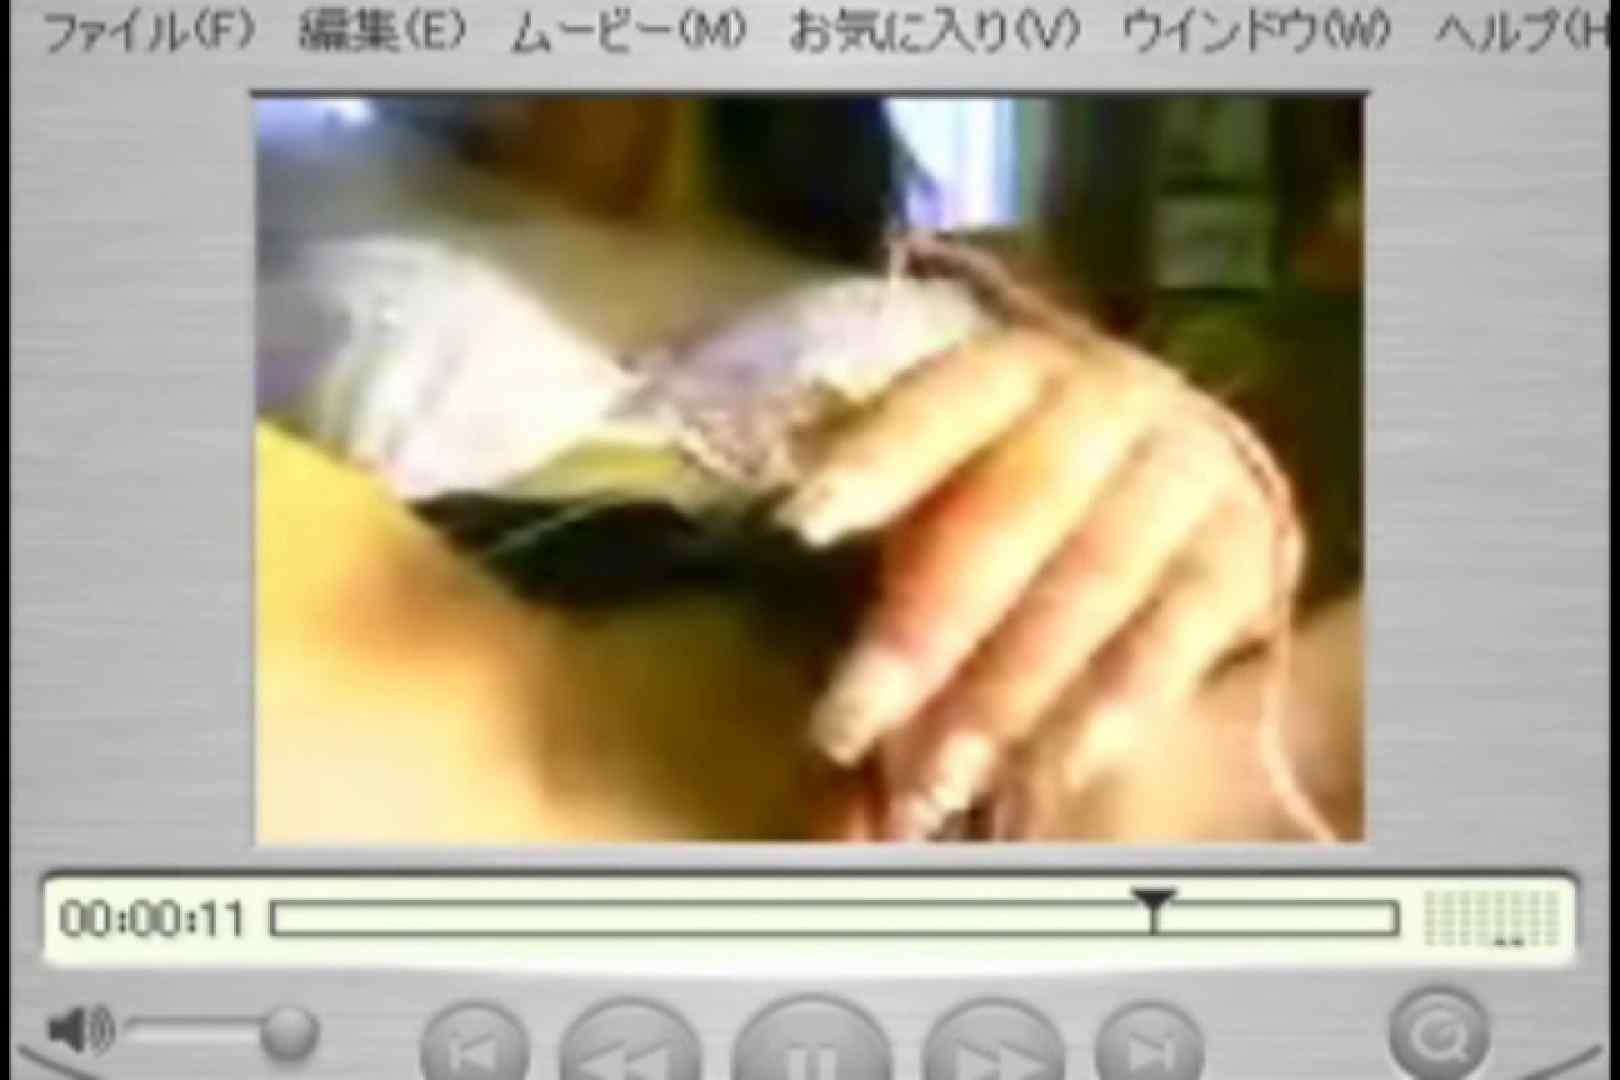 Shigeruのアルバム 流出作品  98pic 32